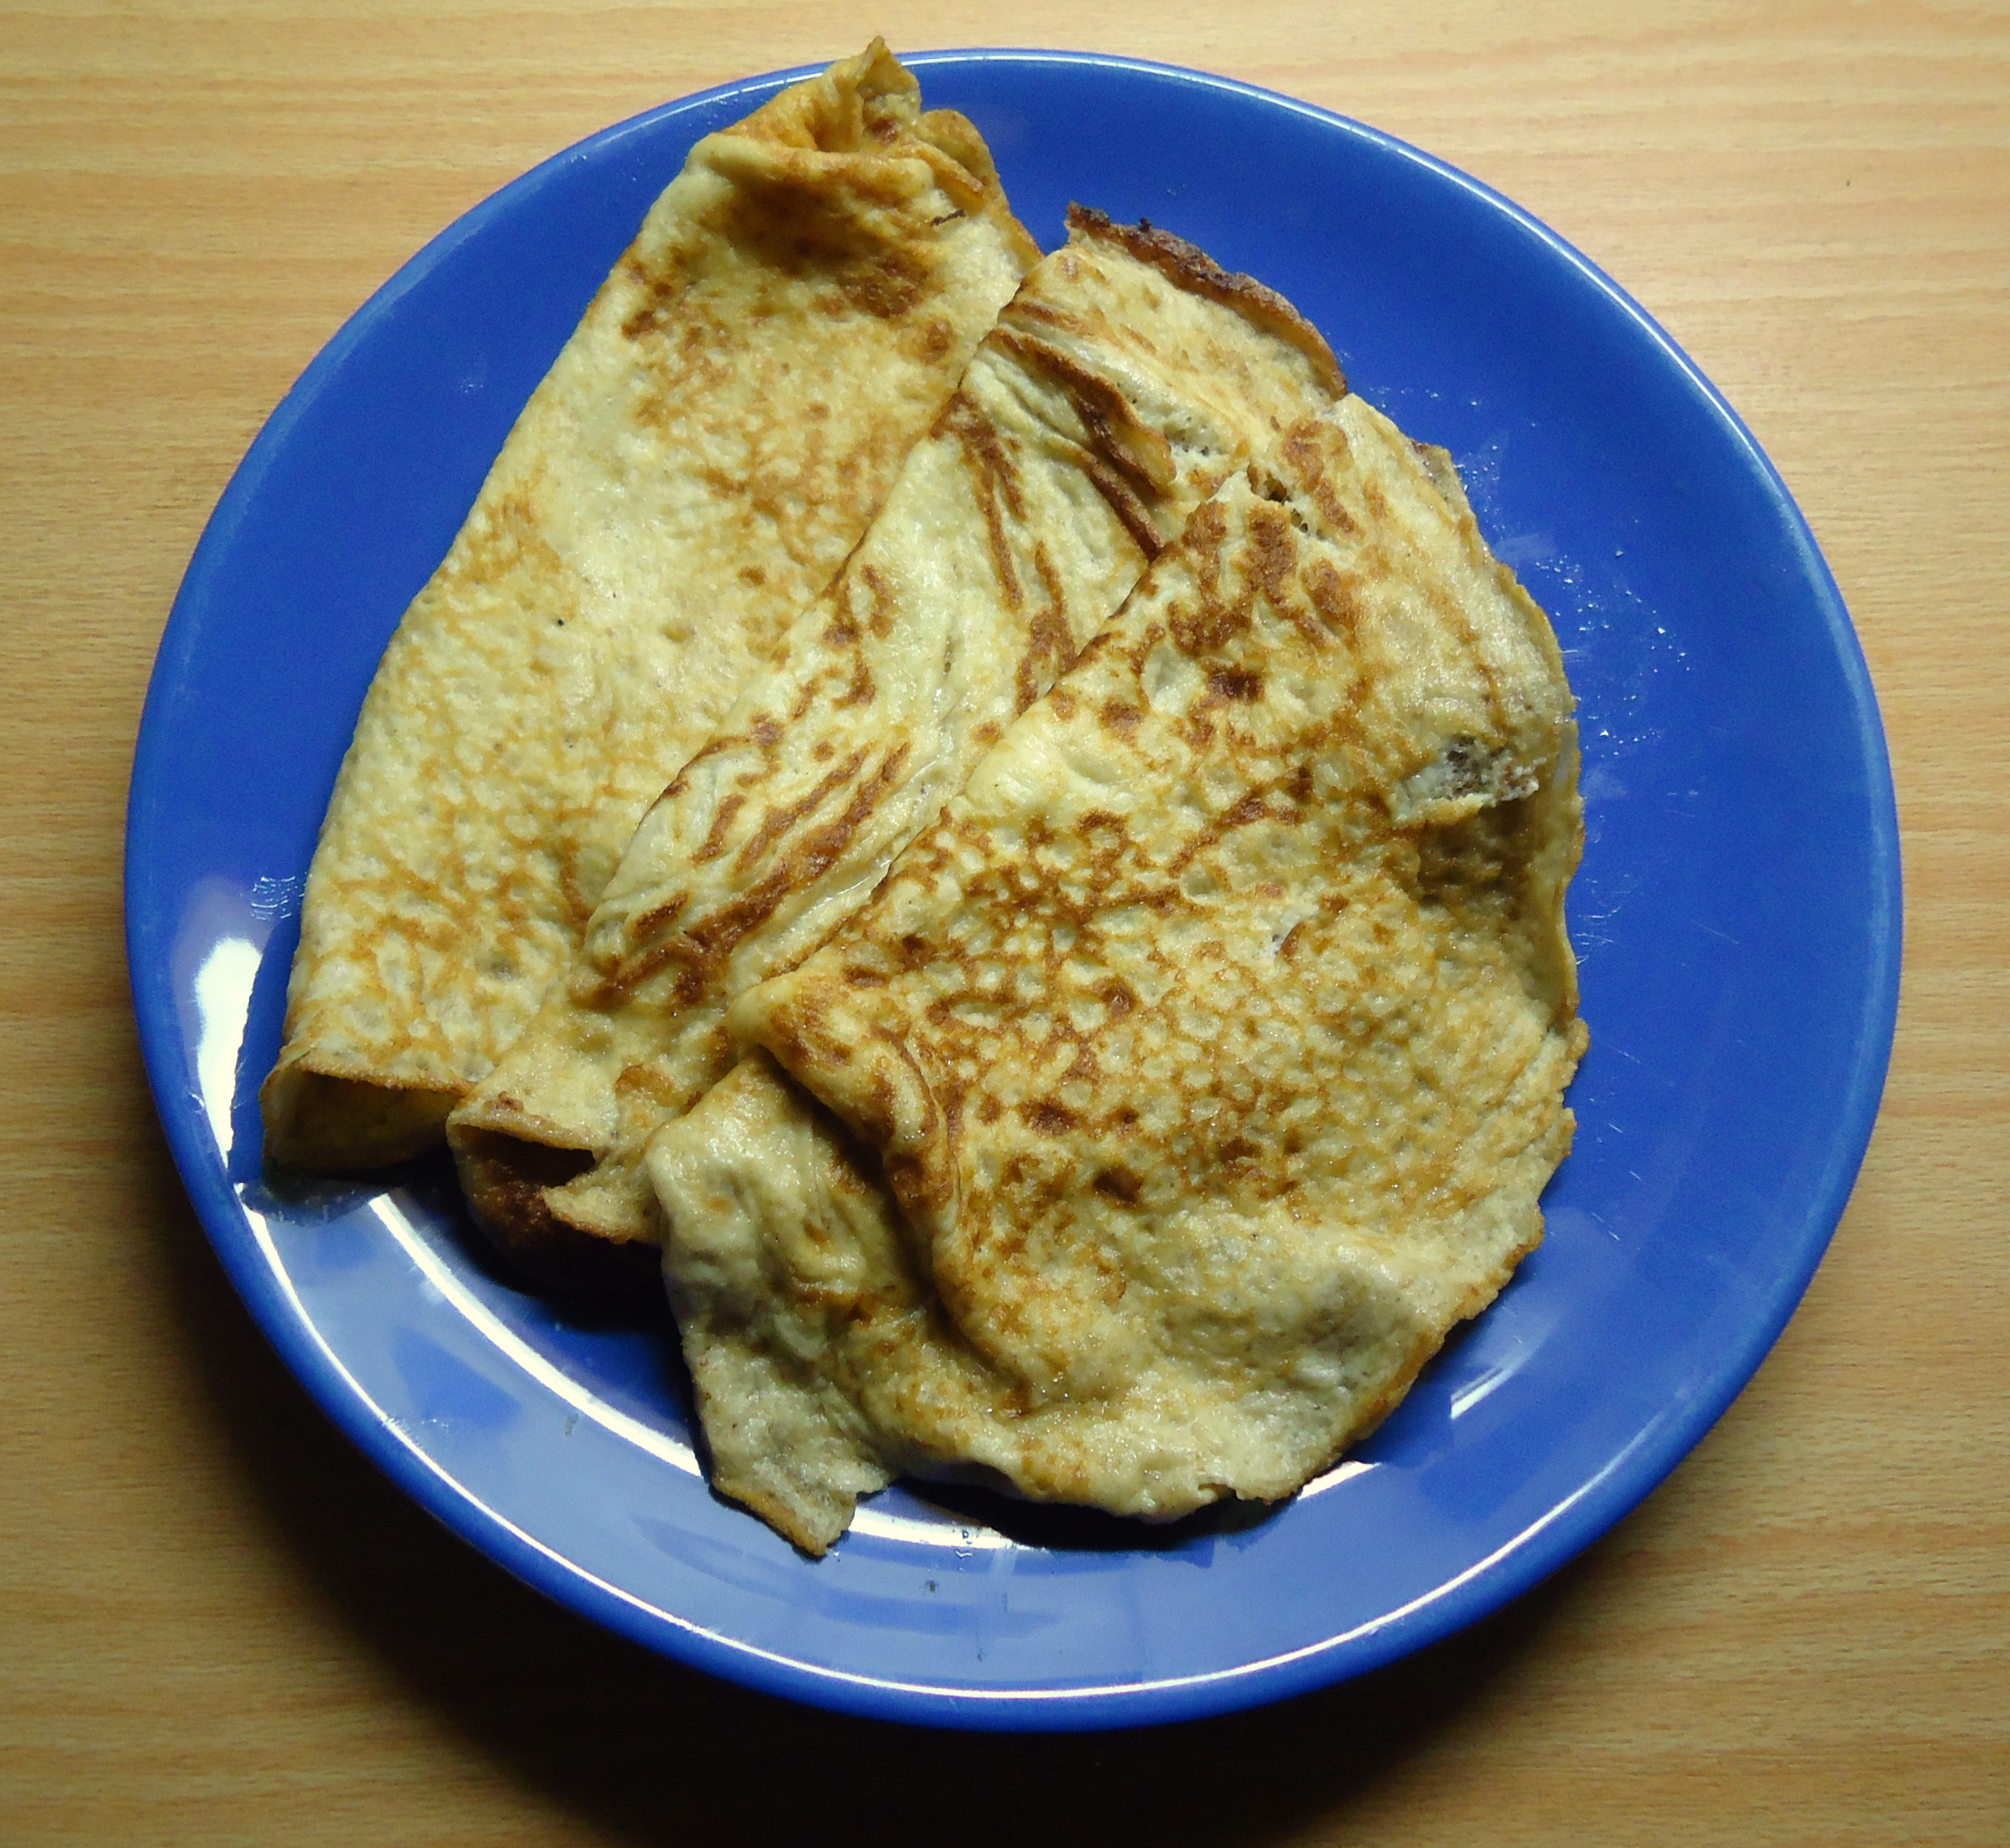 LCHF Crepes / pannkakor